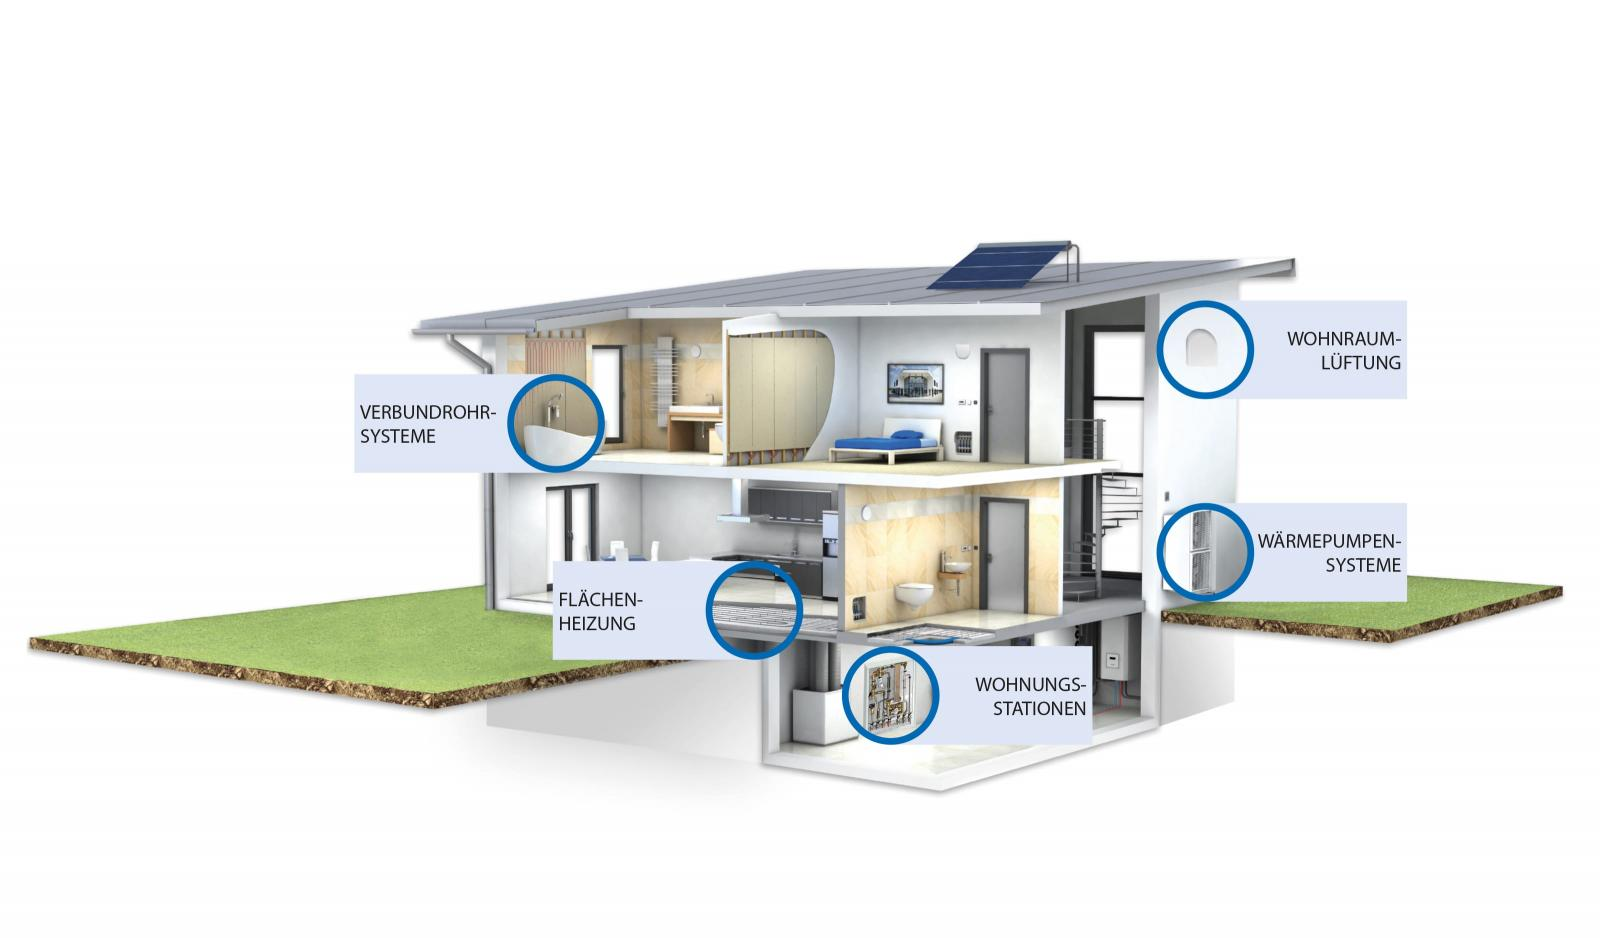 Energiehaus, ZW Plan